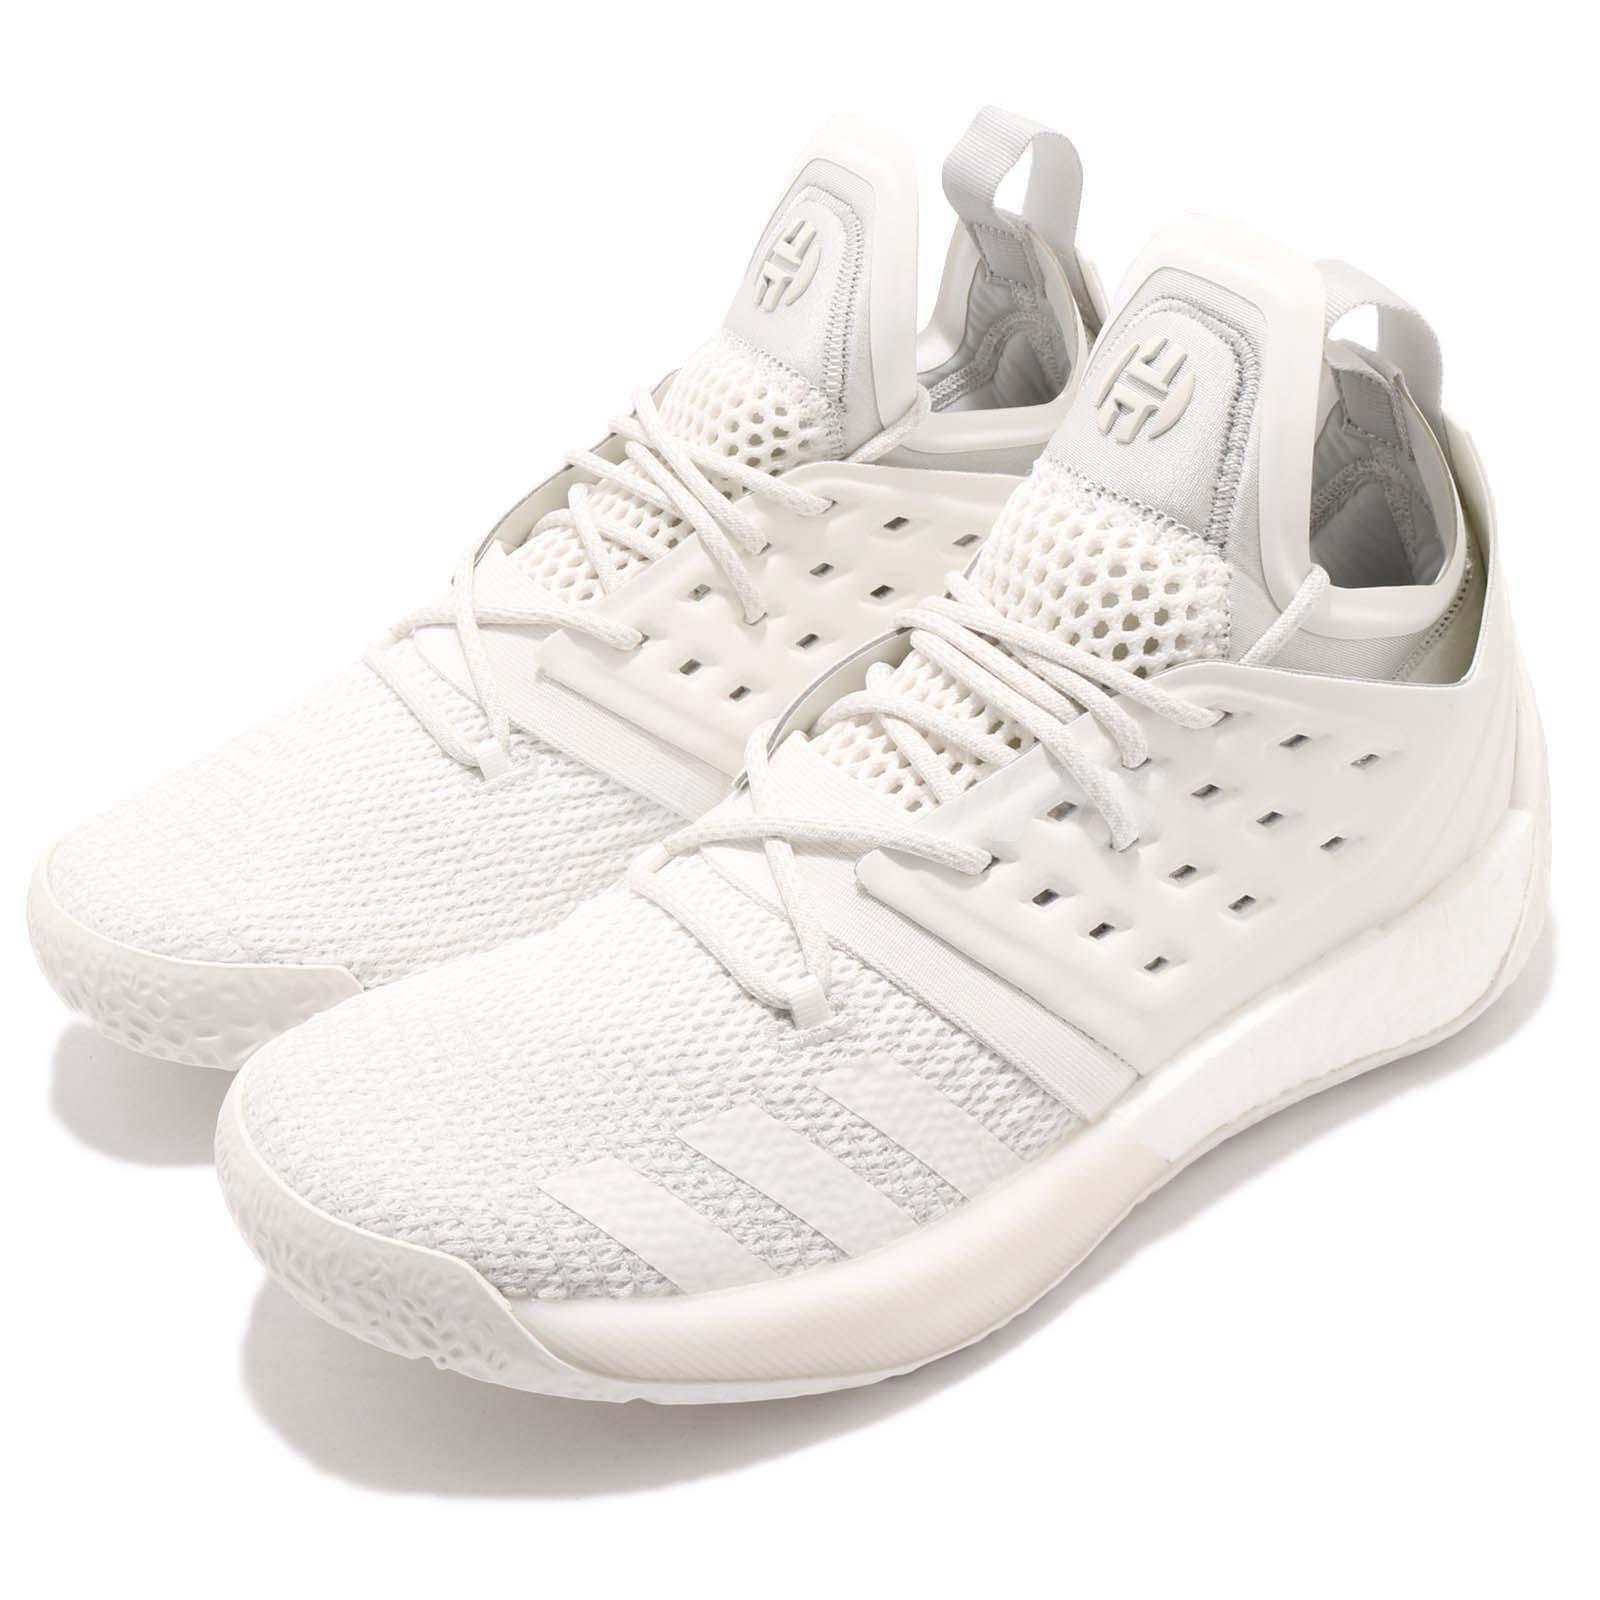 adidas Harden Vol. 2 Boost James James Boost Gris Blanc Men Basketball Chaussures Baskets AP9871 0e2db3